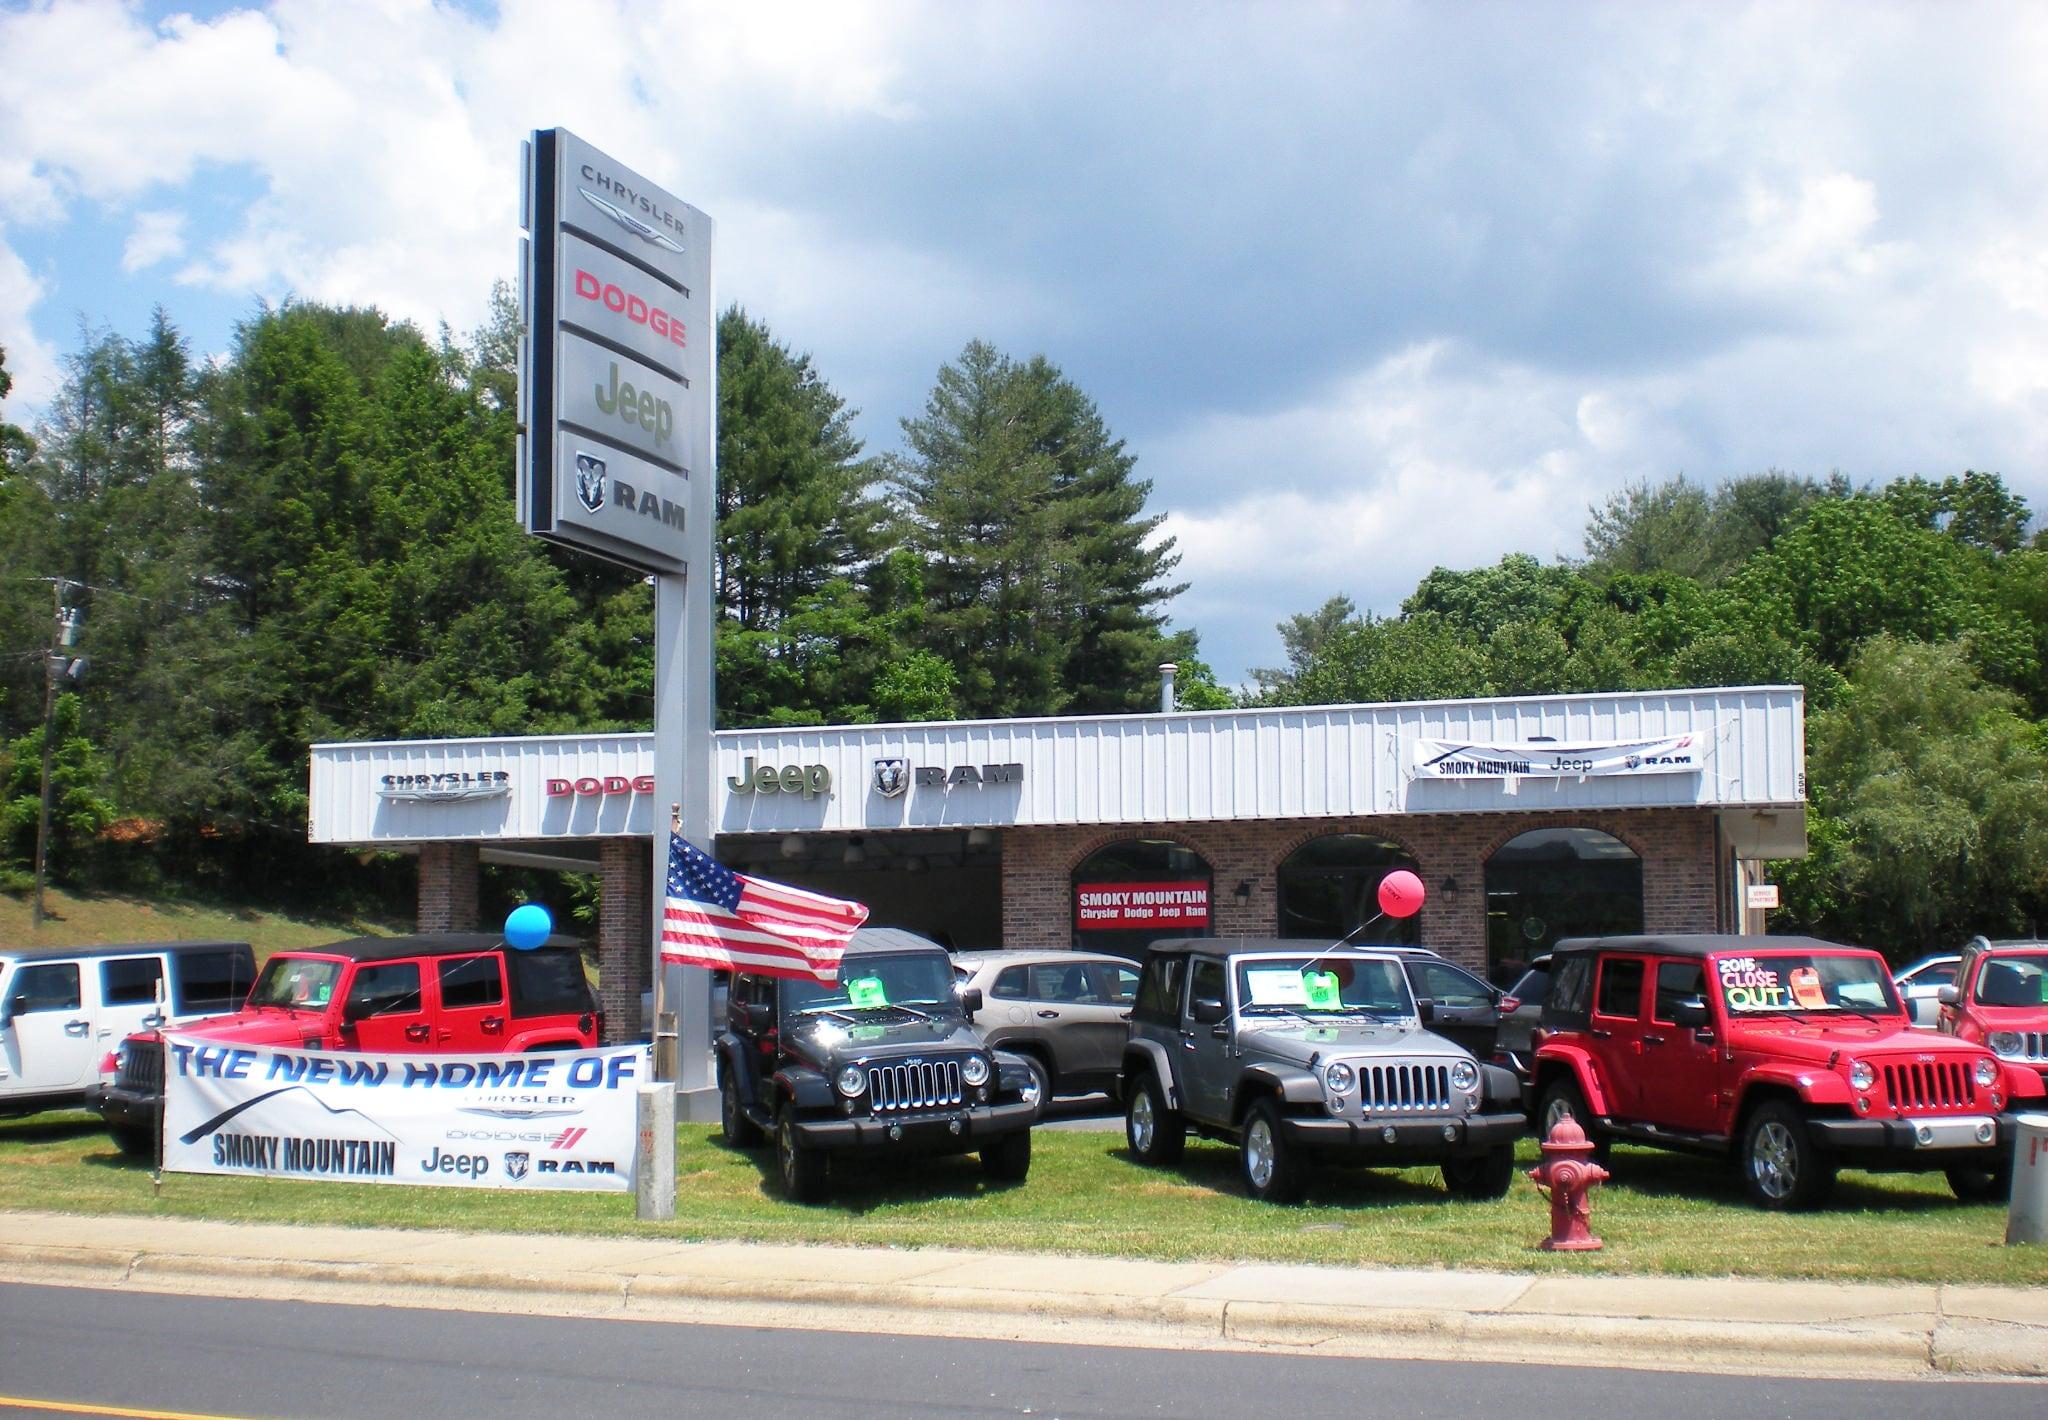 renegade jeep manual parts petrol speed chrysler dealer